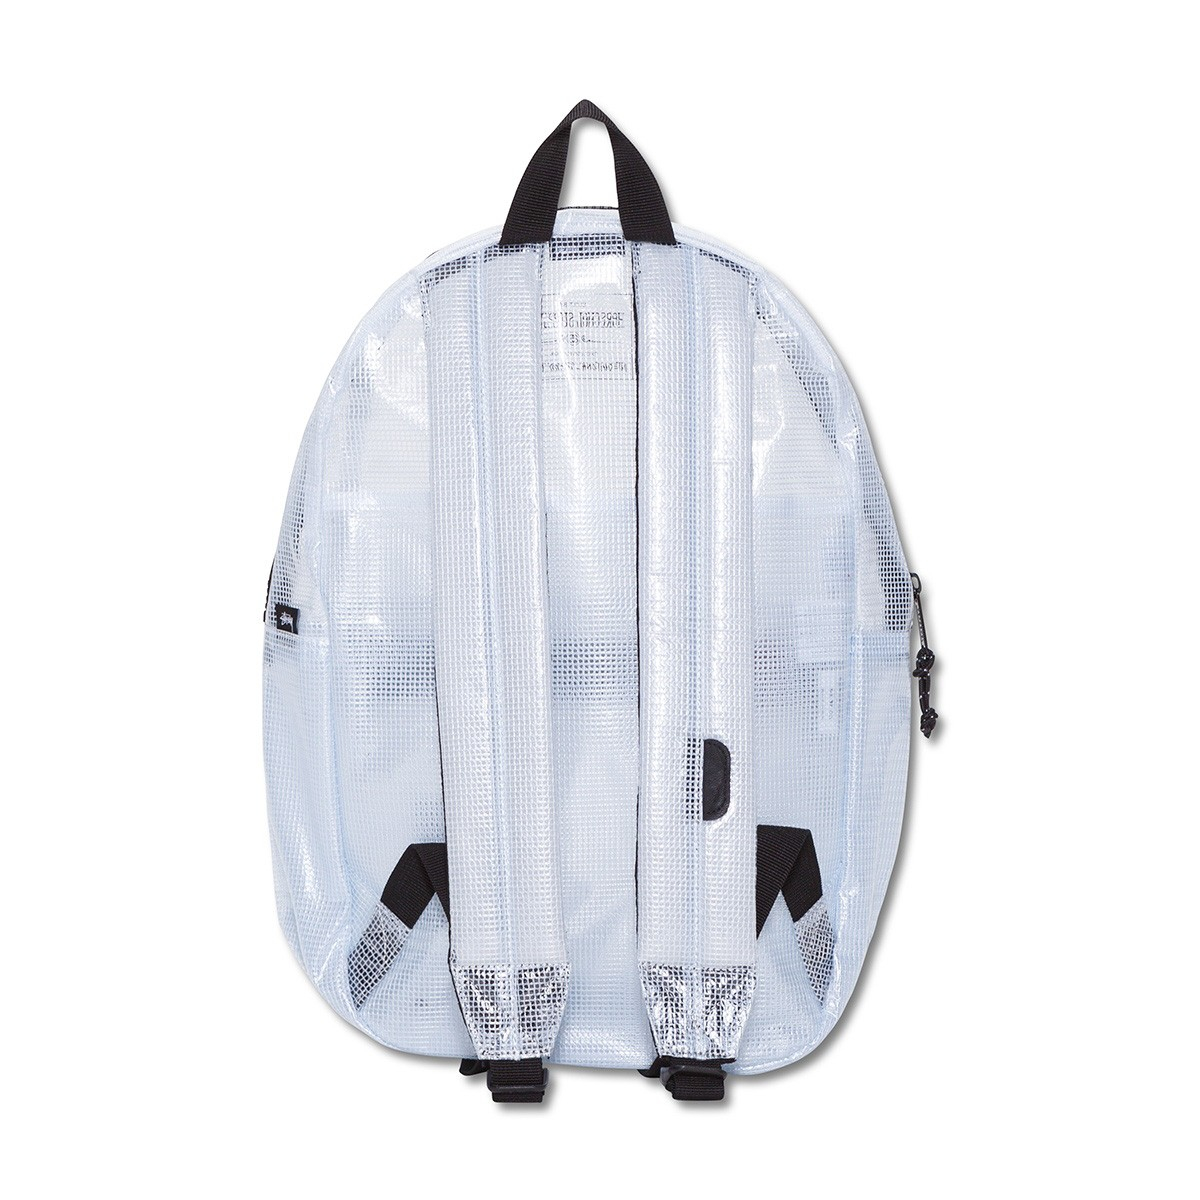 Stussy Herschel Supply Co. Tarpaulin Lawson Backpack in White for Men